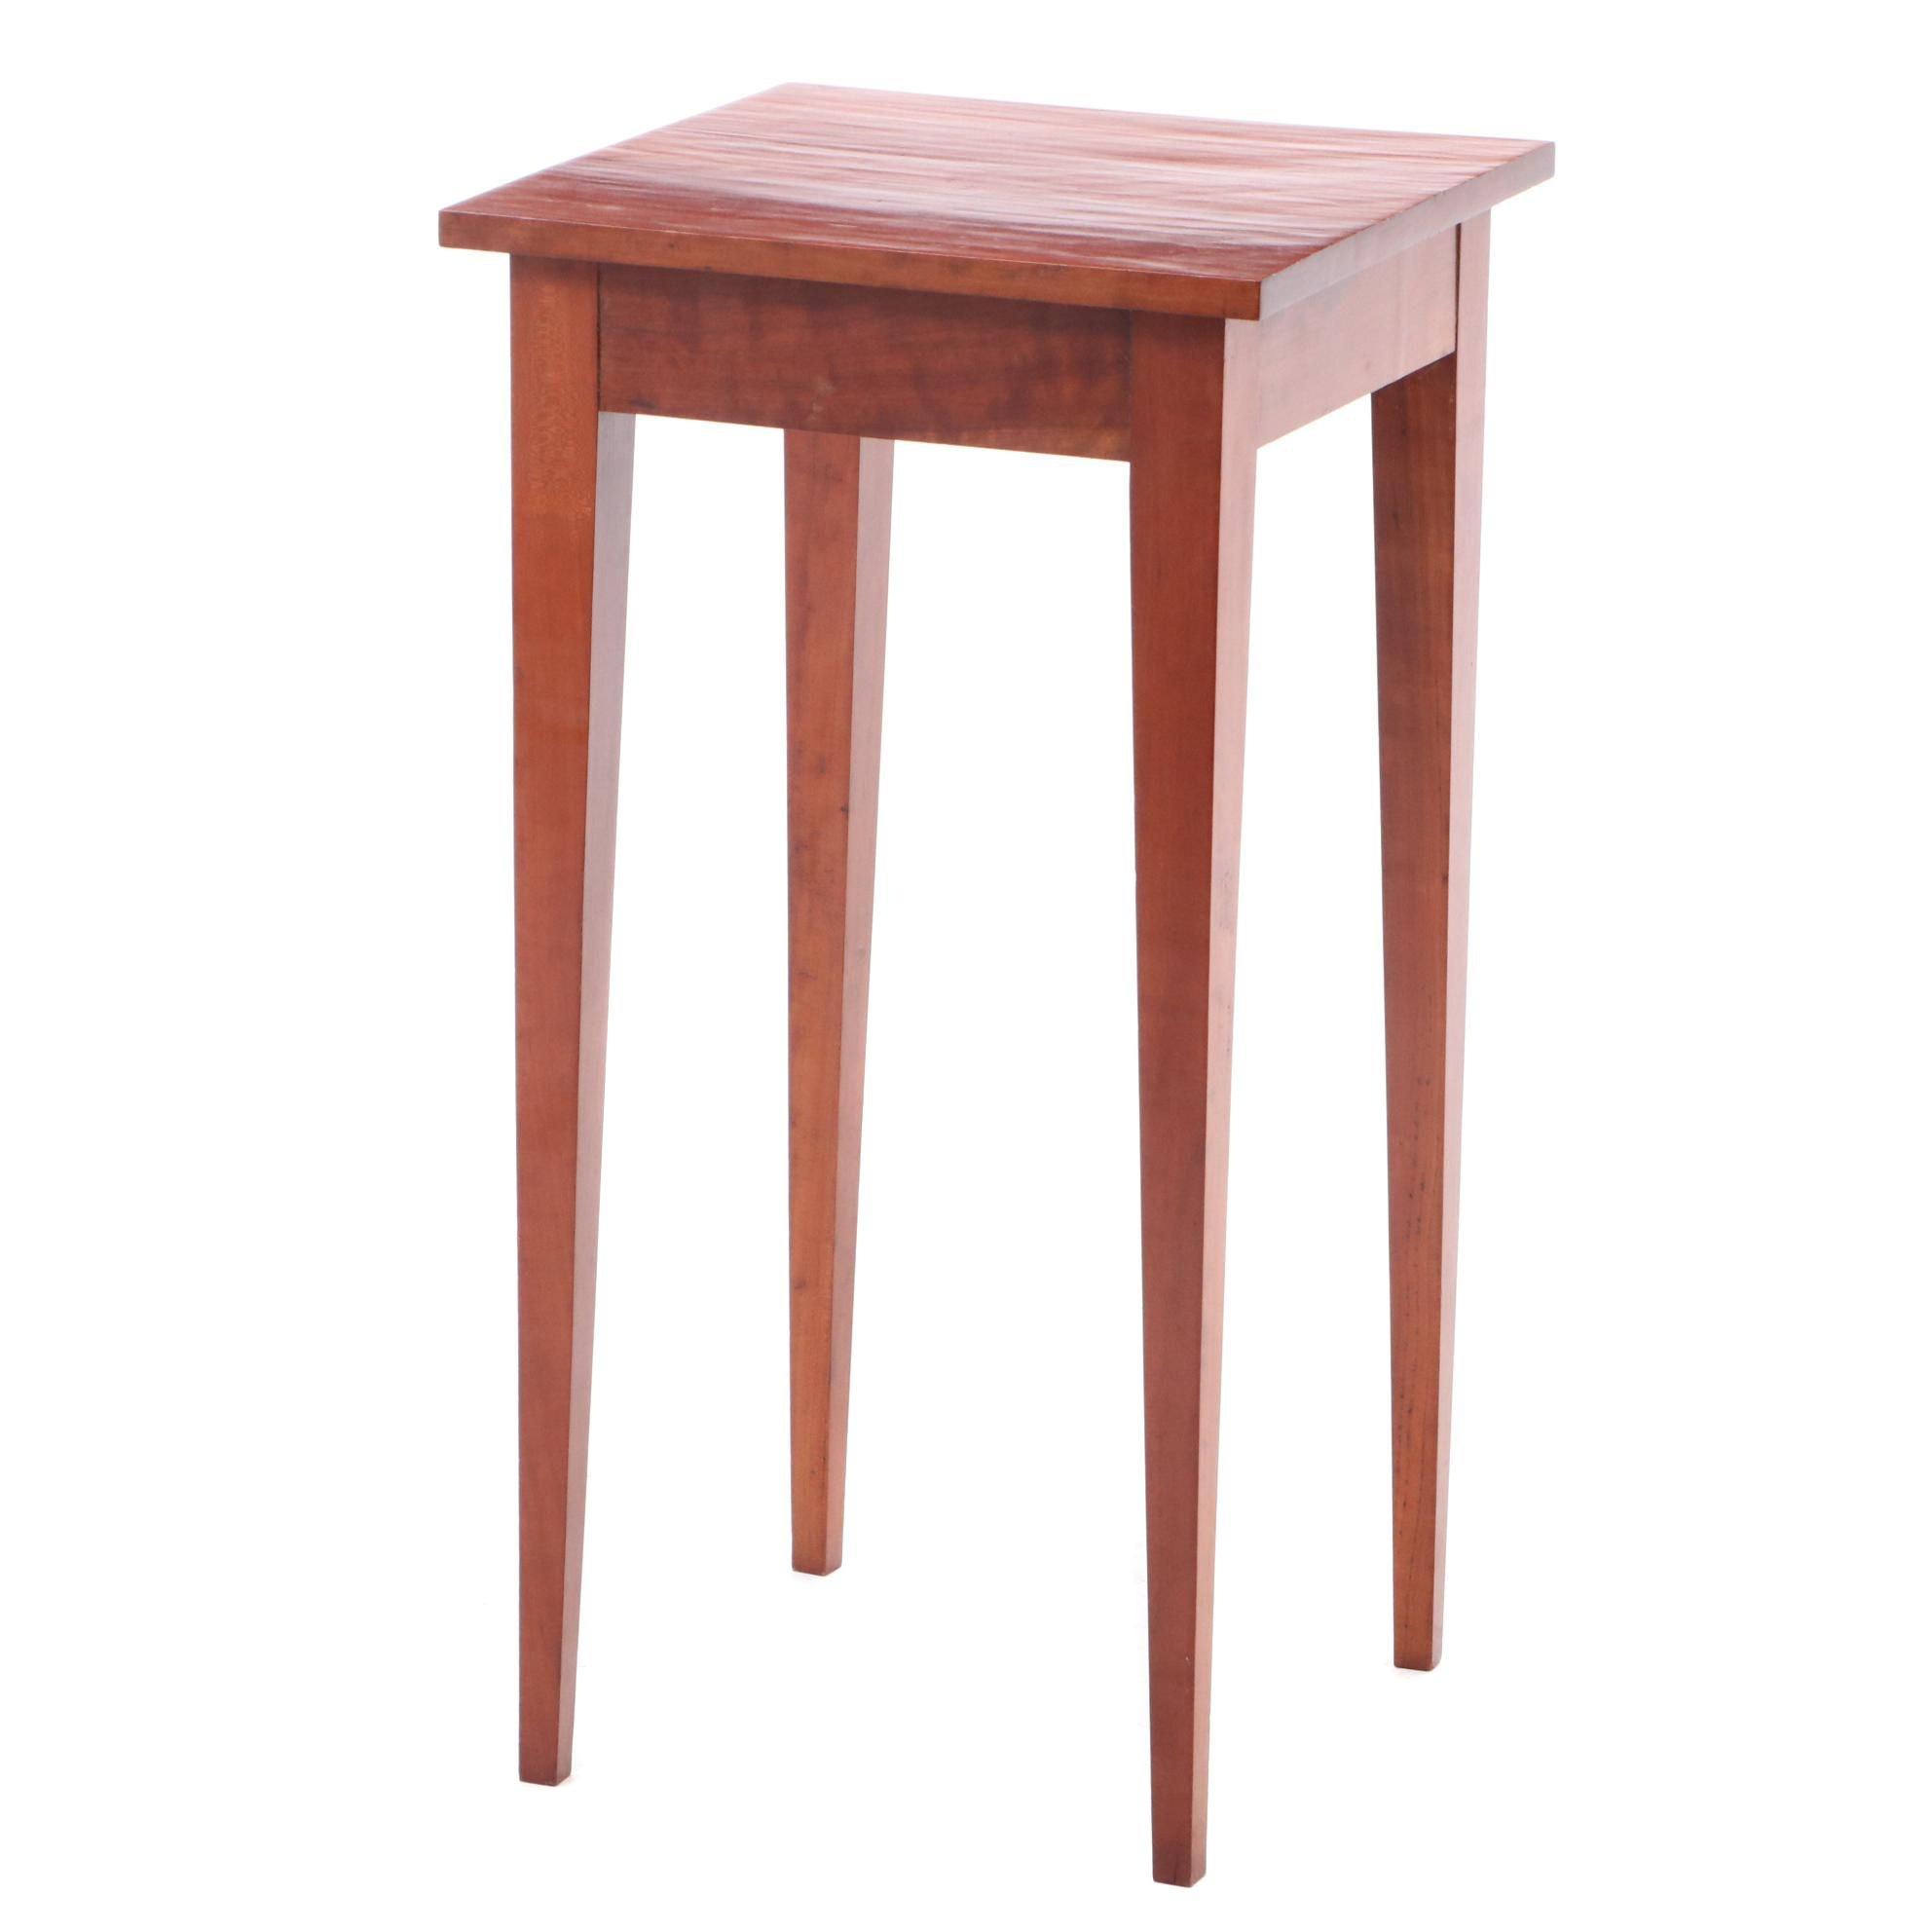 Hepplewhite Style Cherry Side Table